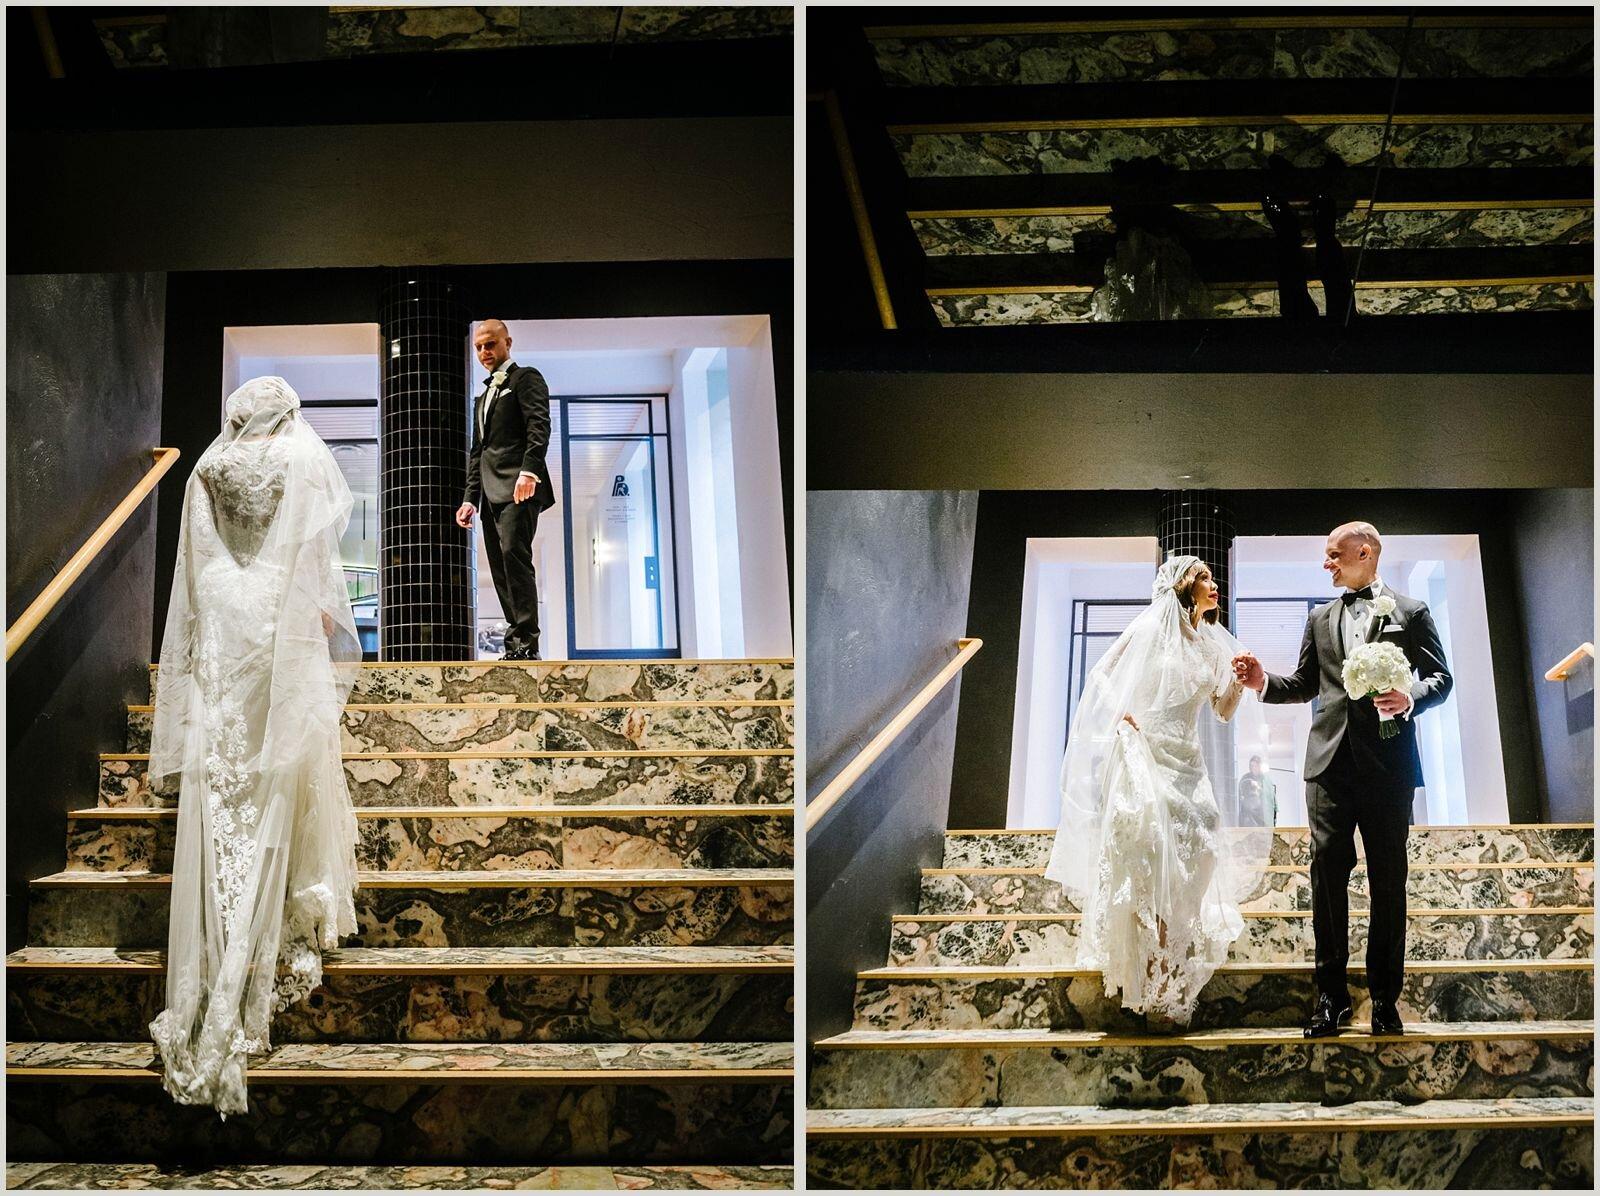 joseph_koprek_wedding_melbourne_the_prince_deck_0024.jpg